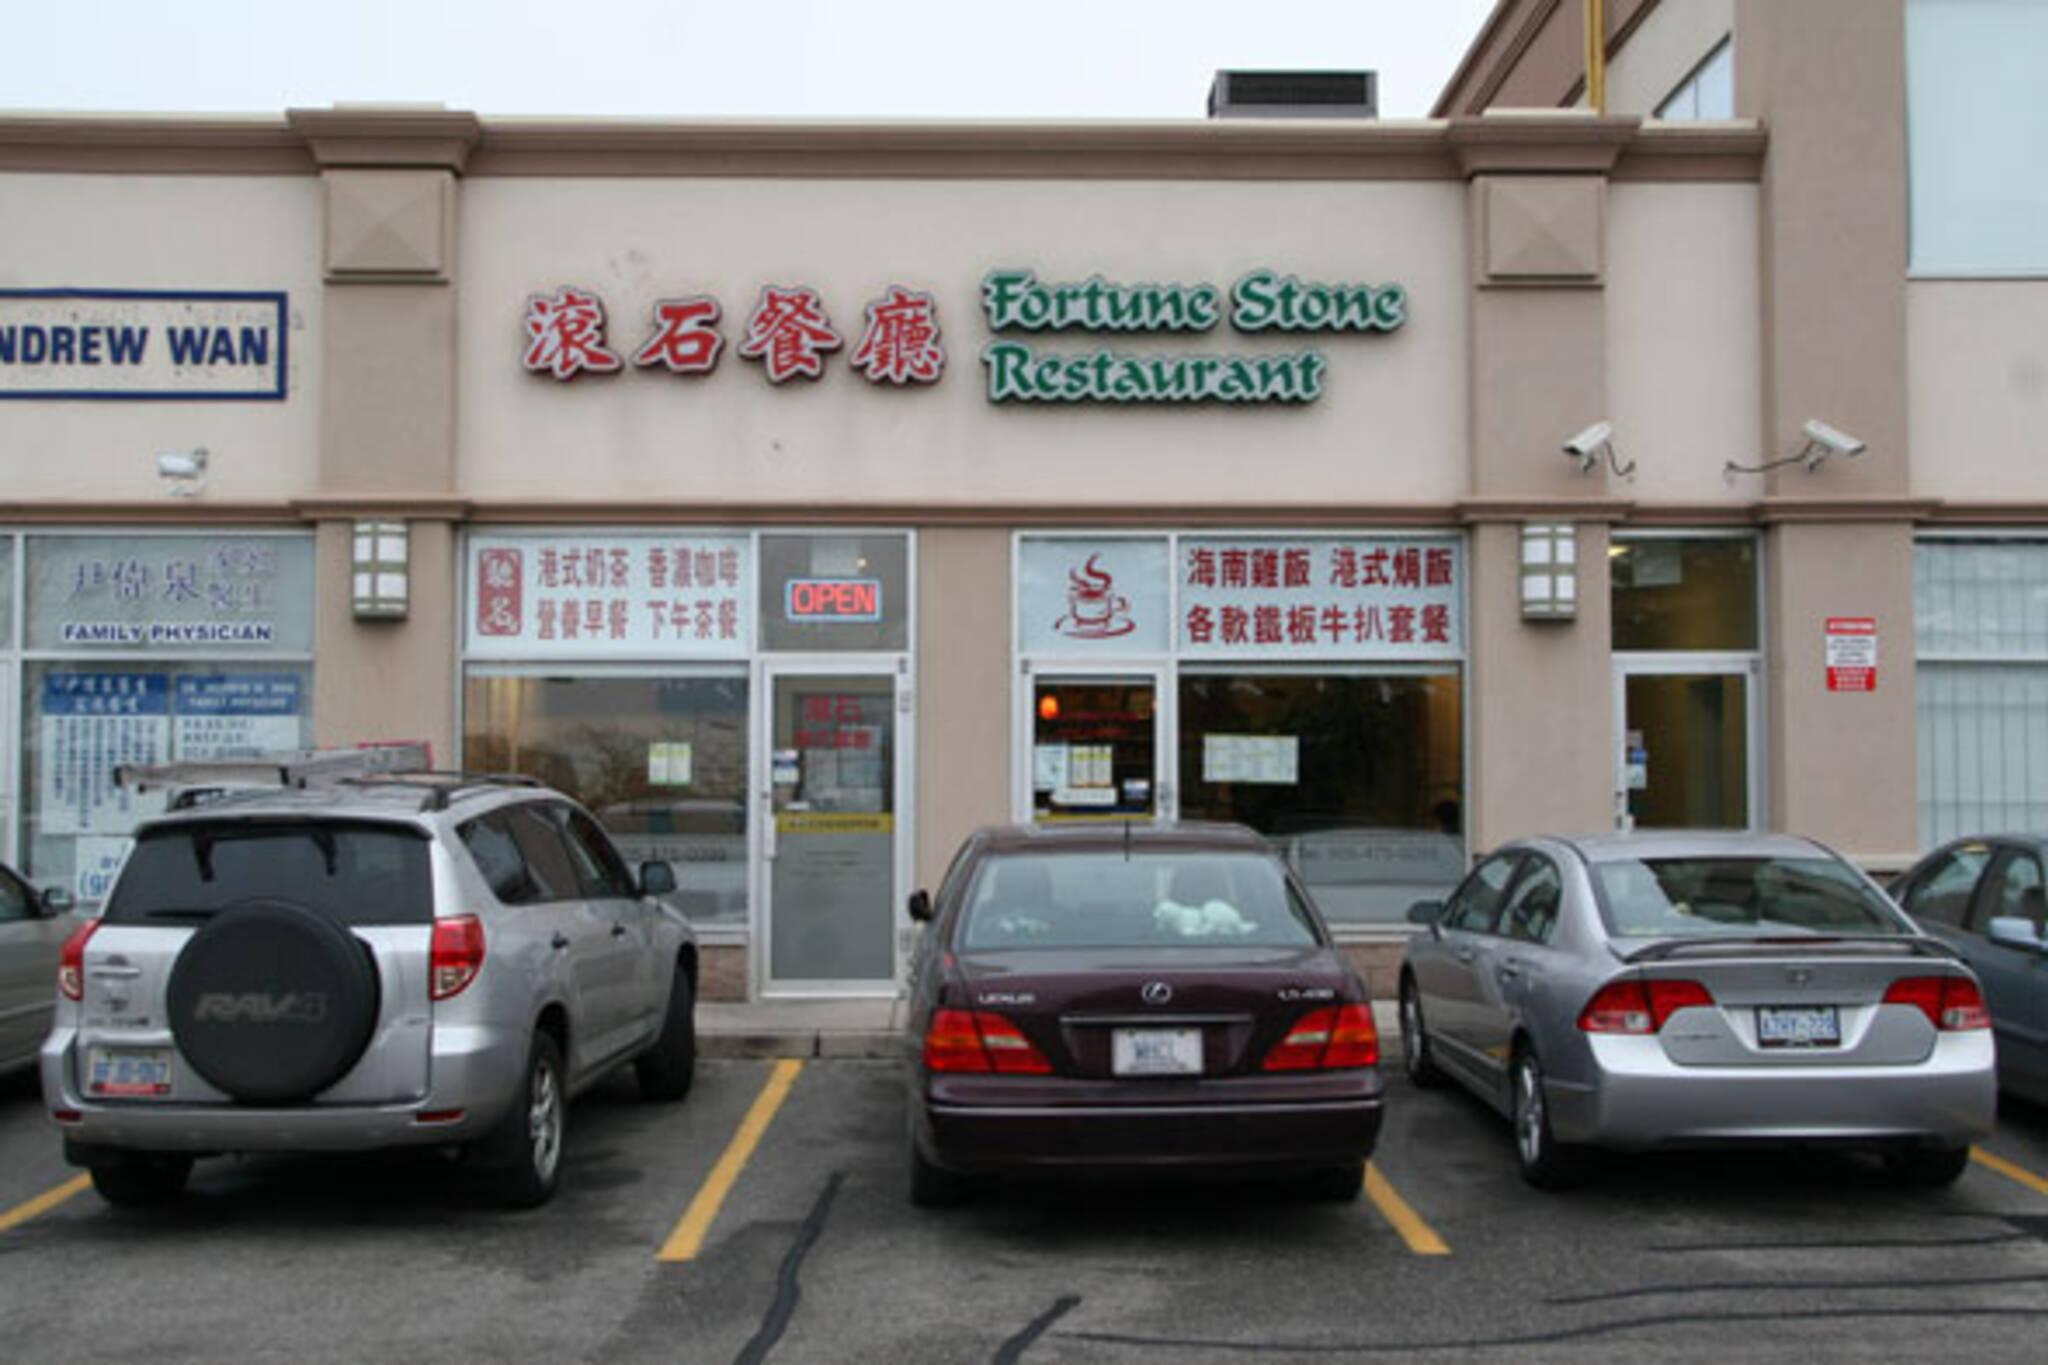 Fortune Stone Restaurant